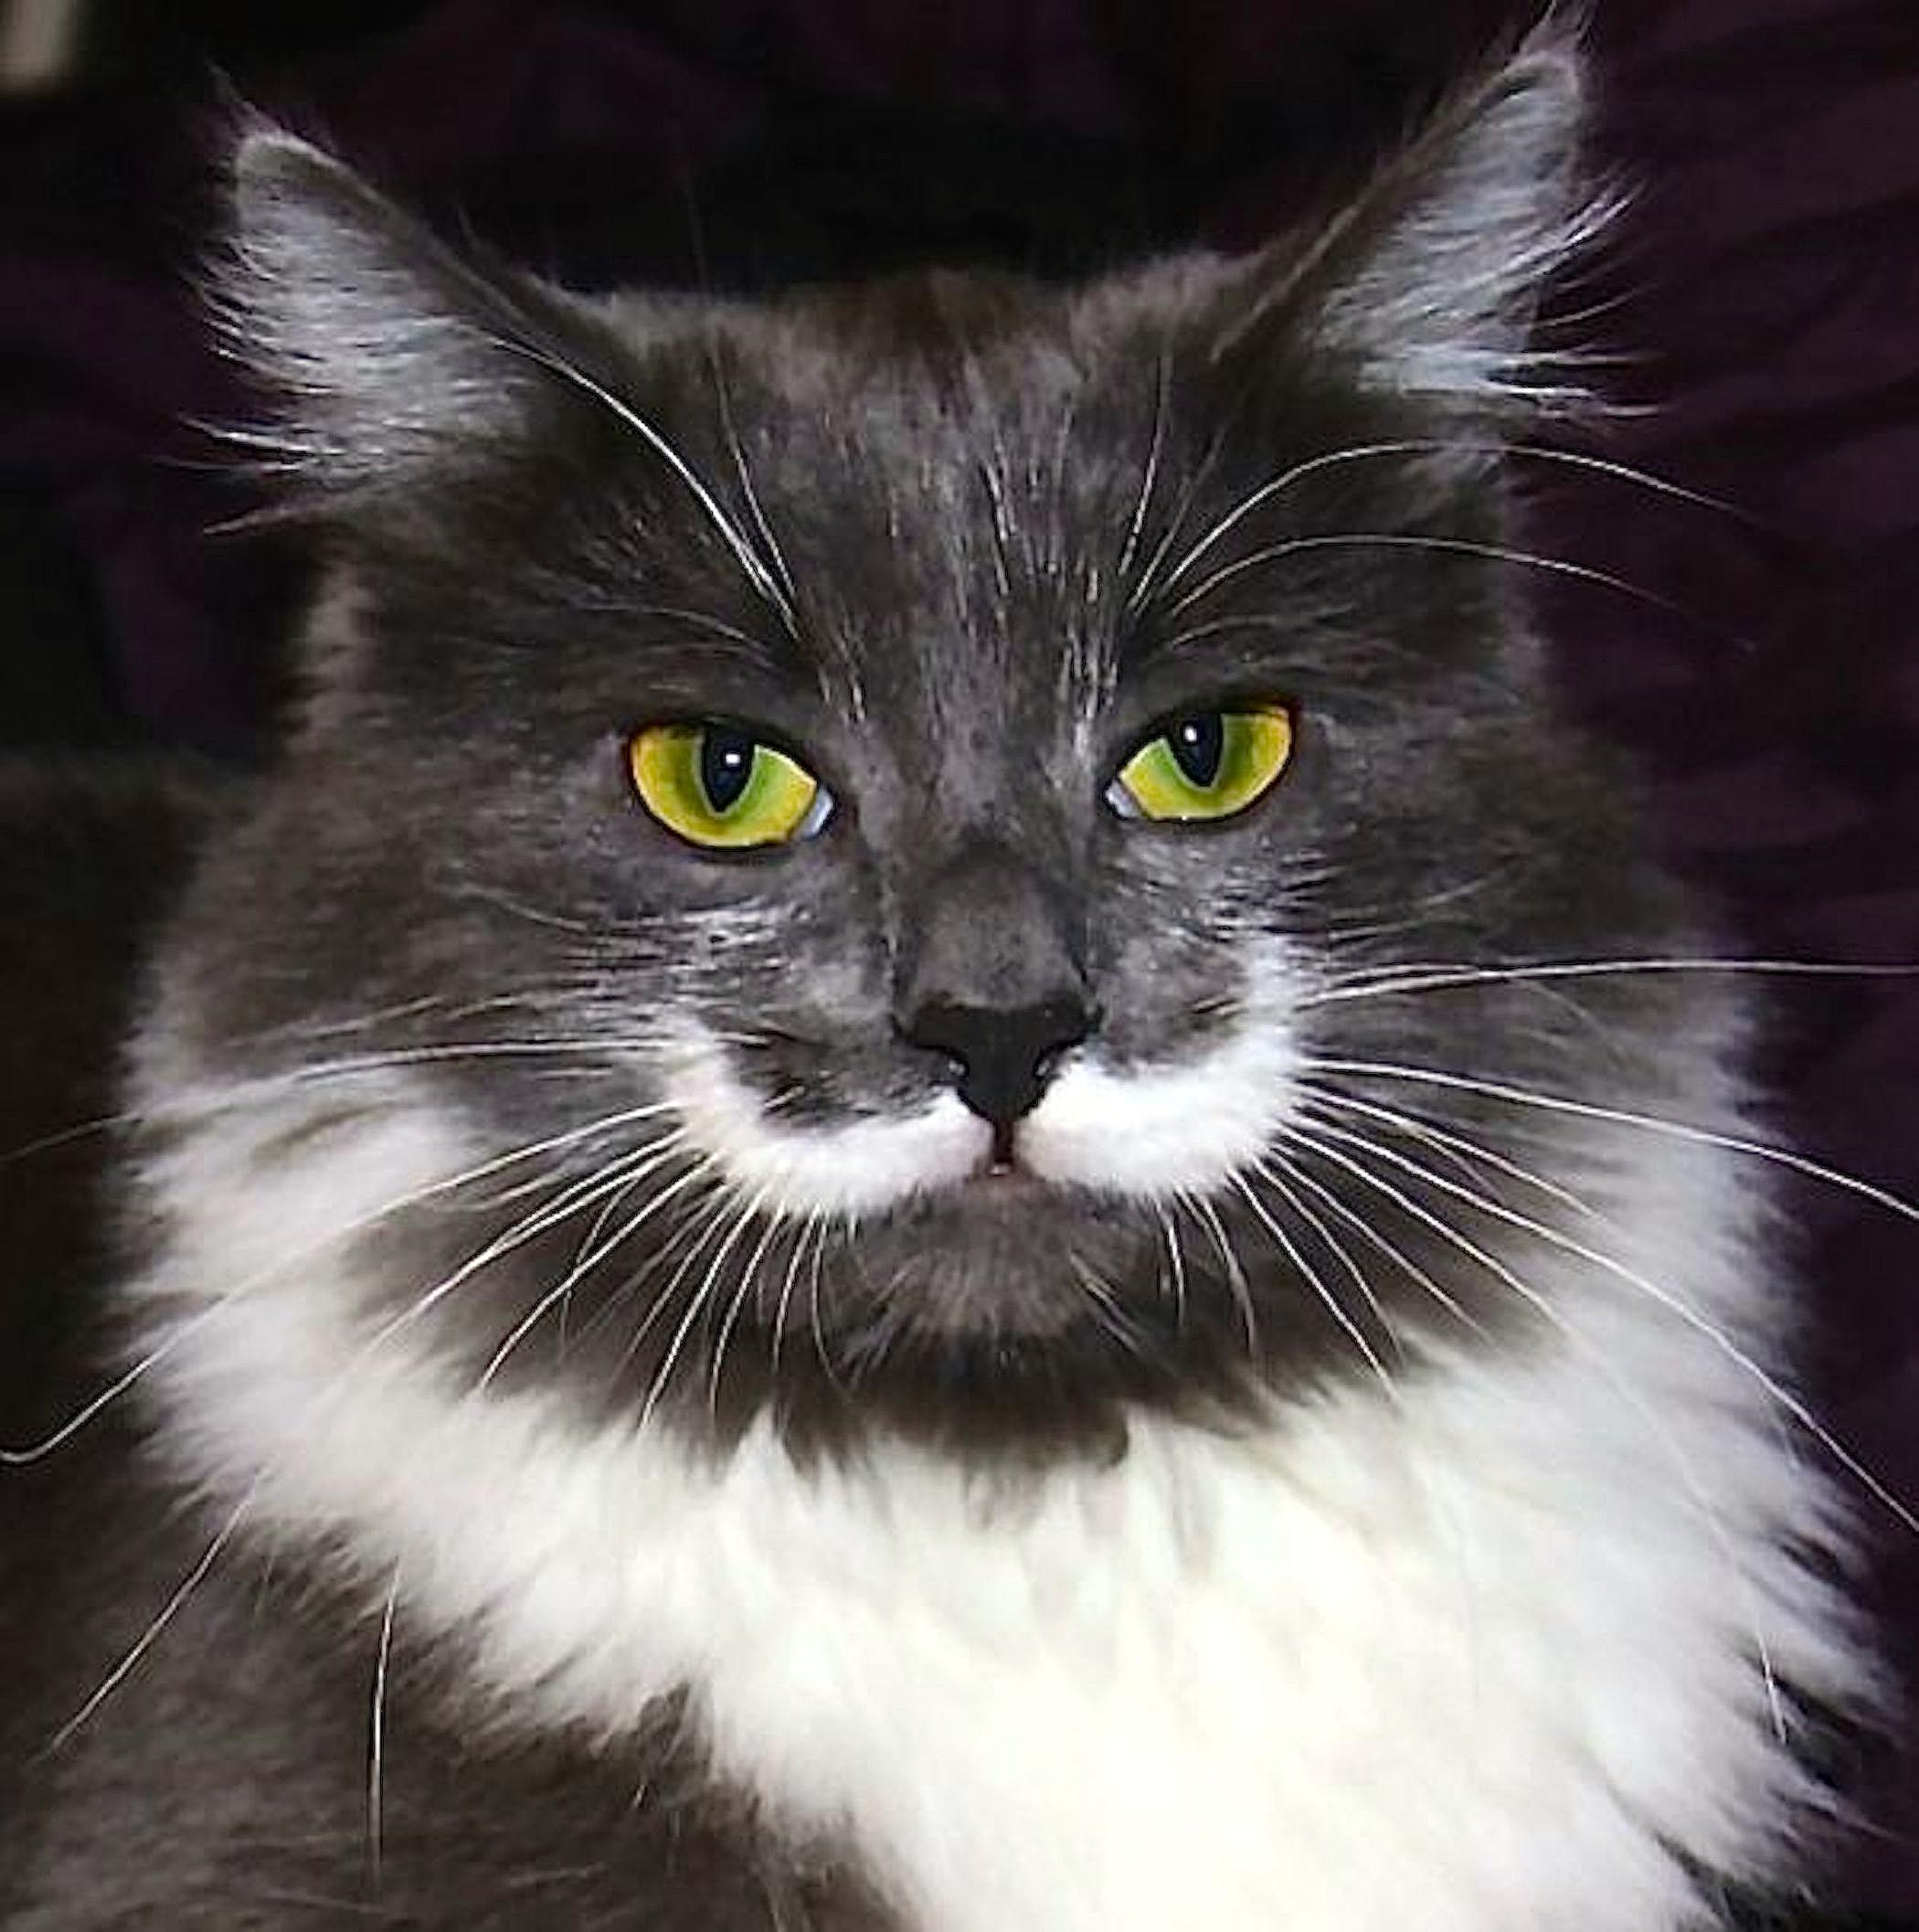 Cat Mustache Wallpaper-Free HD Animal Screen Savers